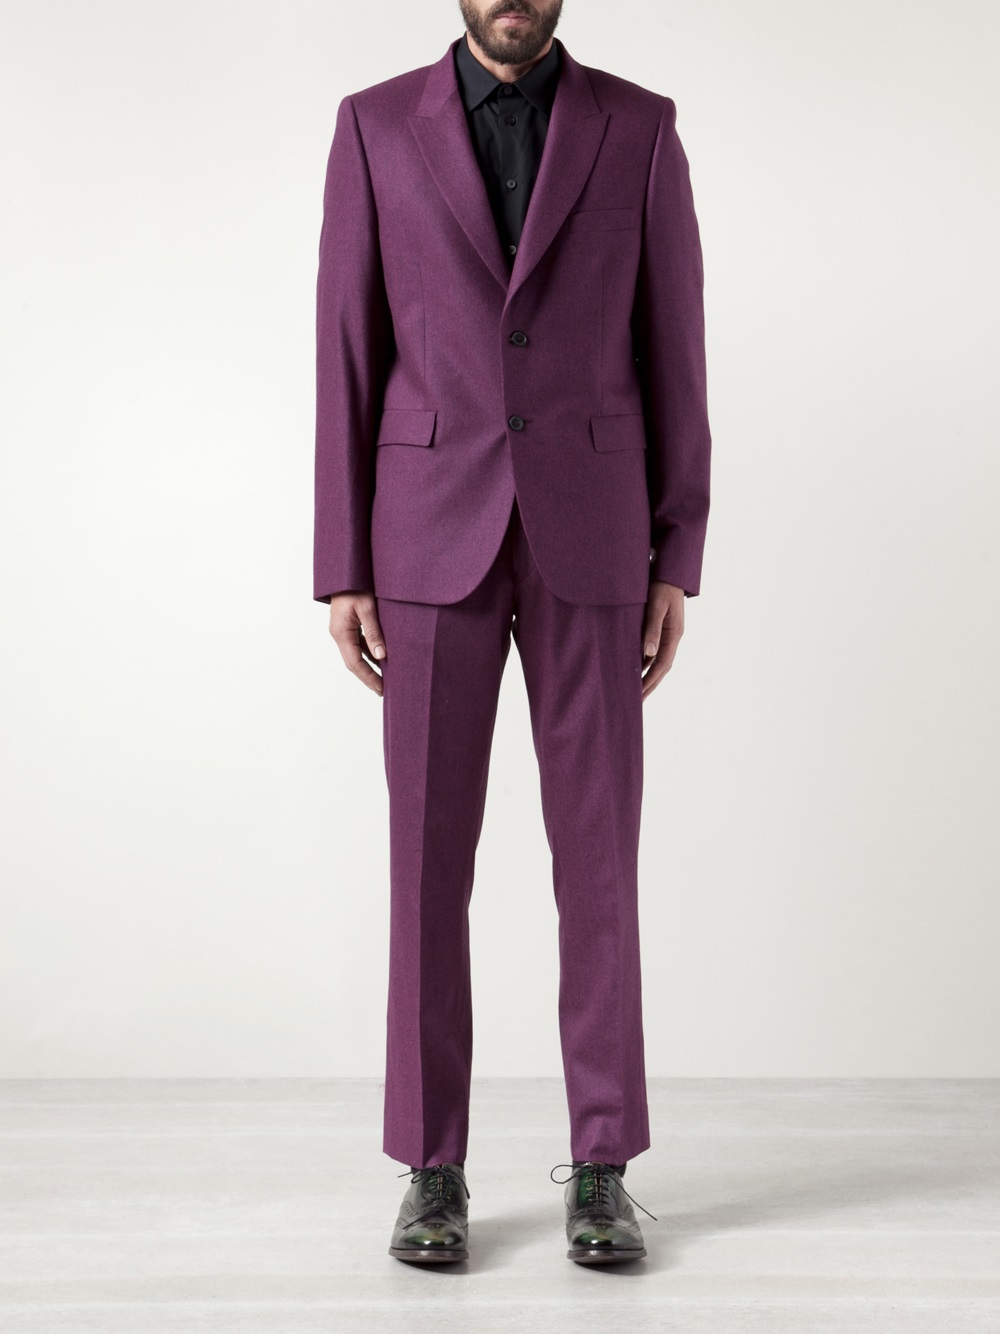 Lyst Paul Smith Formal Suit Jacket In Purple For Men